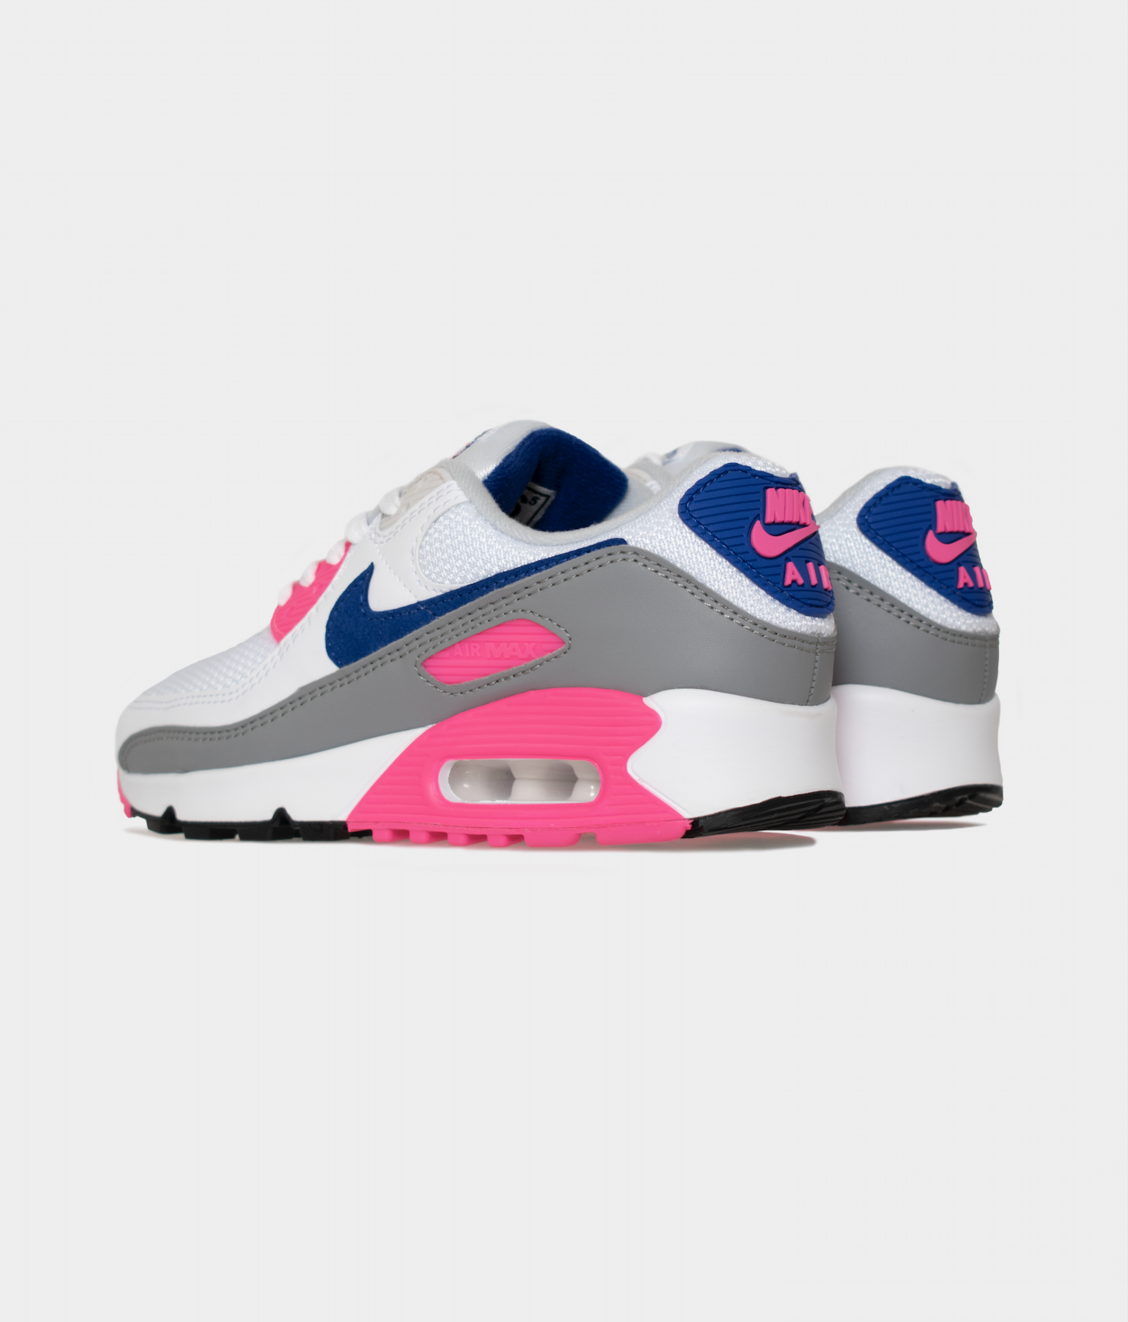 Nike Nike Air Max 90 III Concord Pink Blast